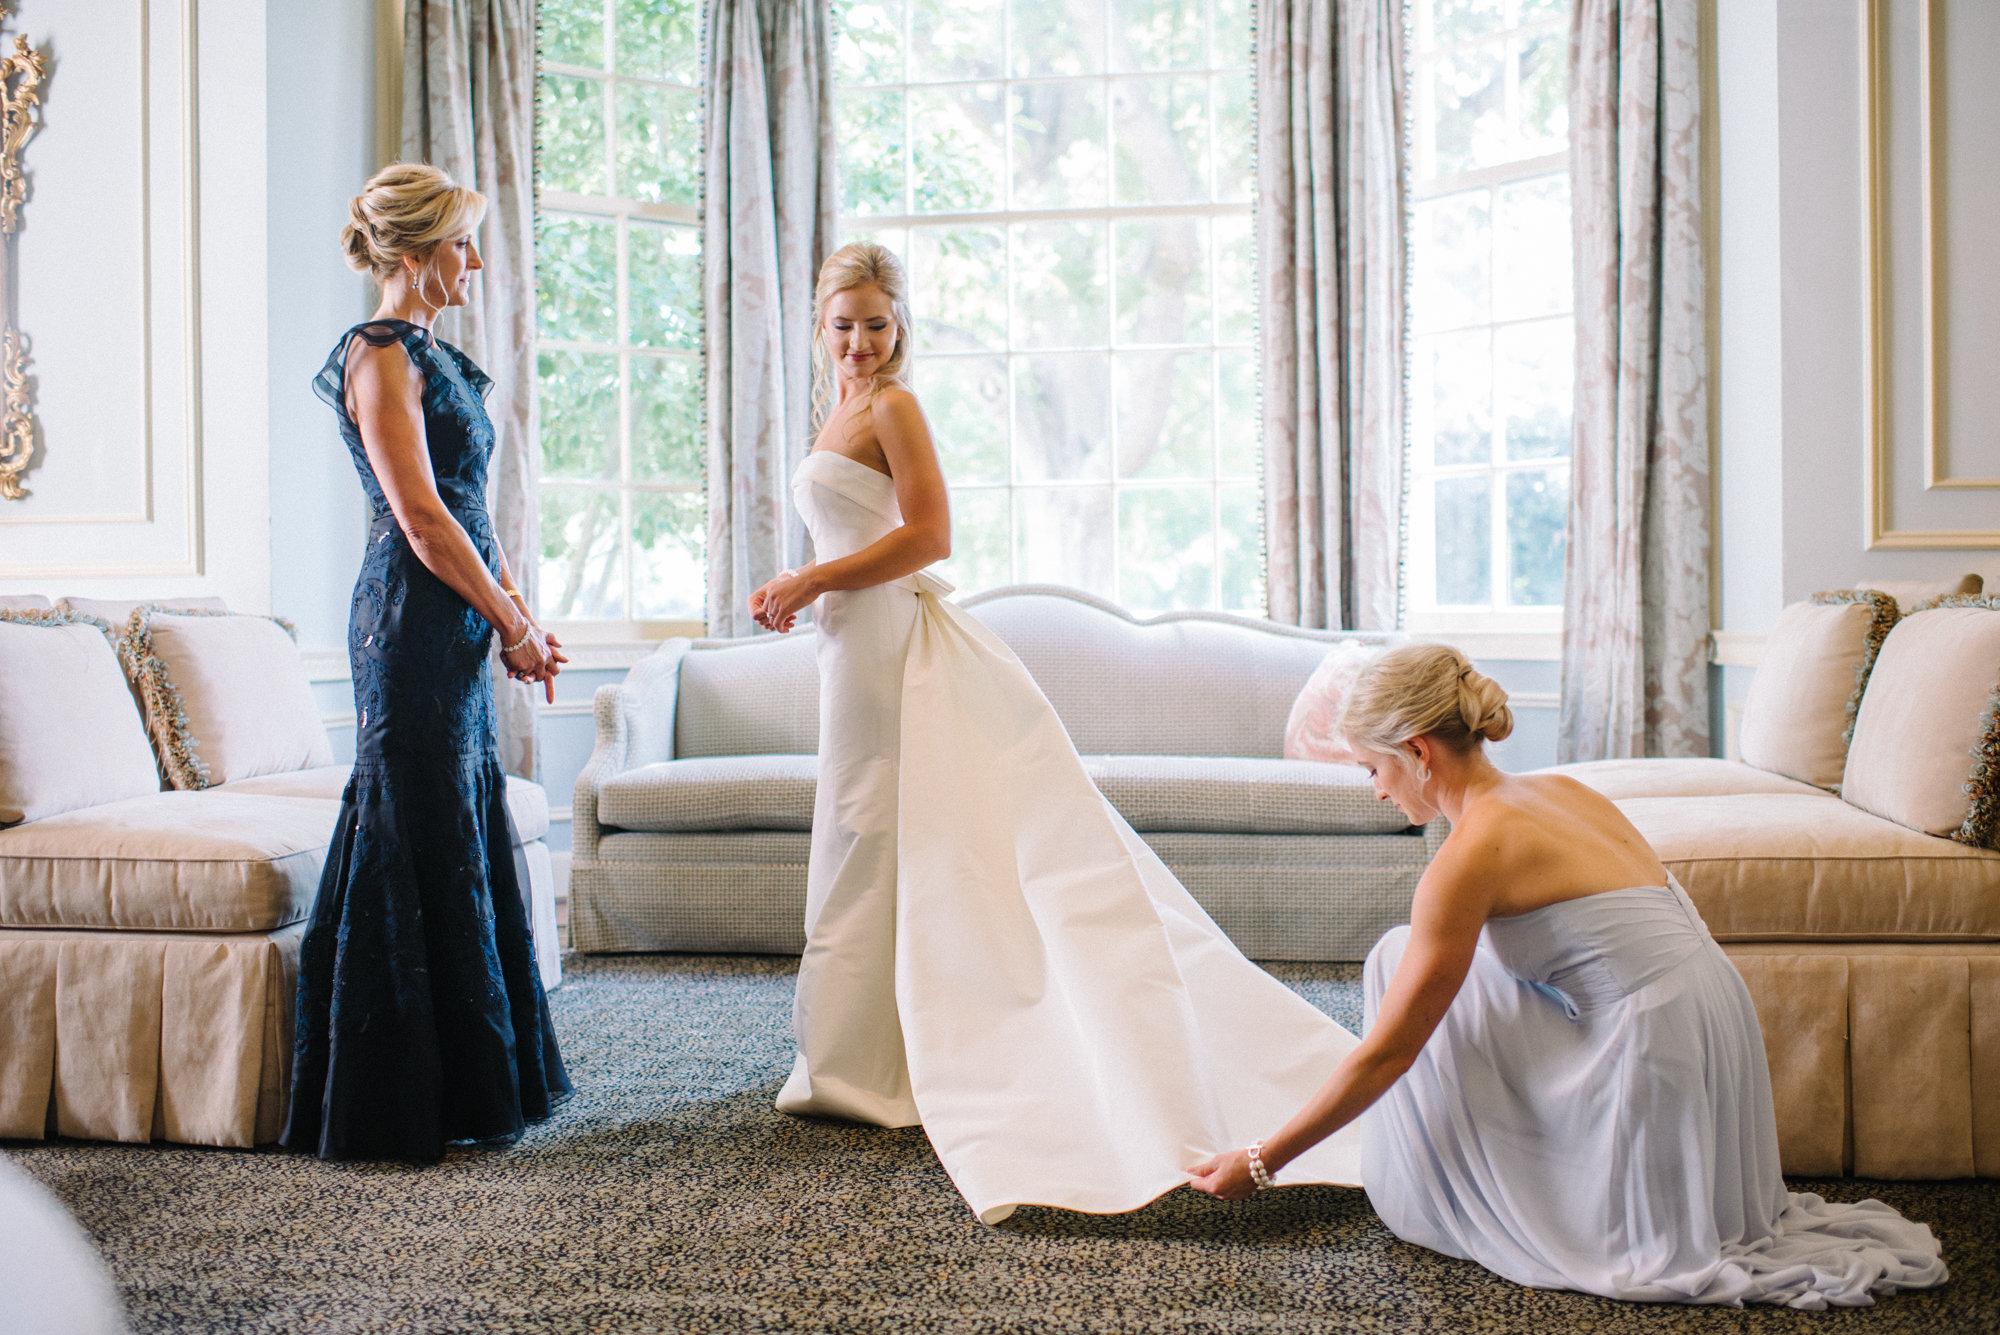 Wedding Photography in Myrtle Beach - Charleston Wedding Photographer